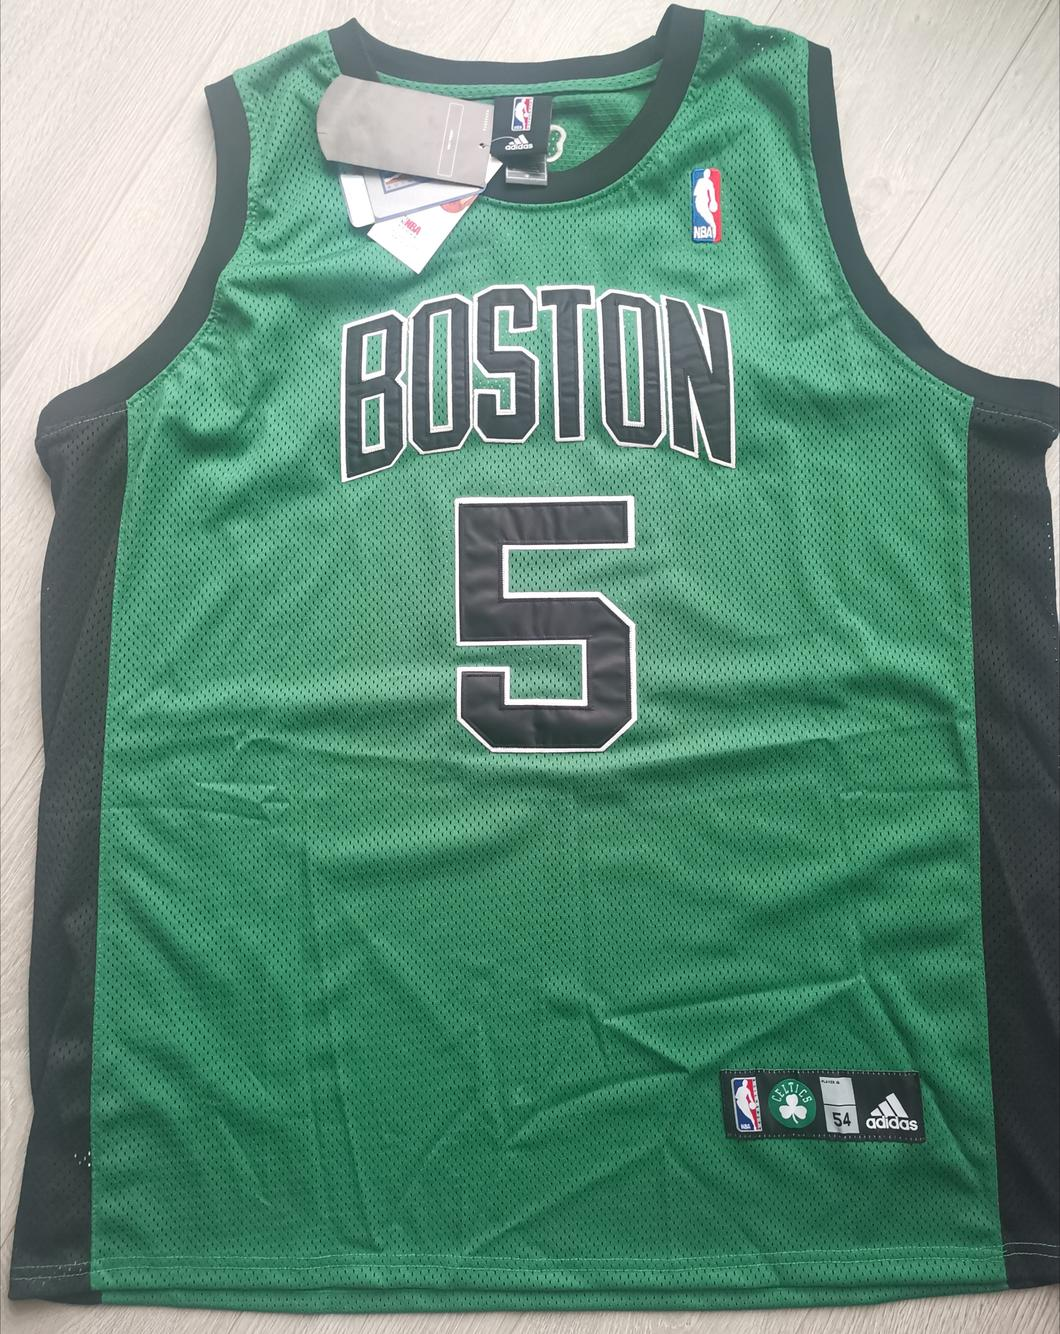 Kevin Garnett NBA Boston Celtics Authentic Away Jersey | SidelineSwap